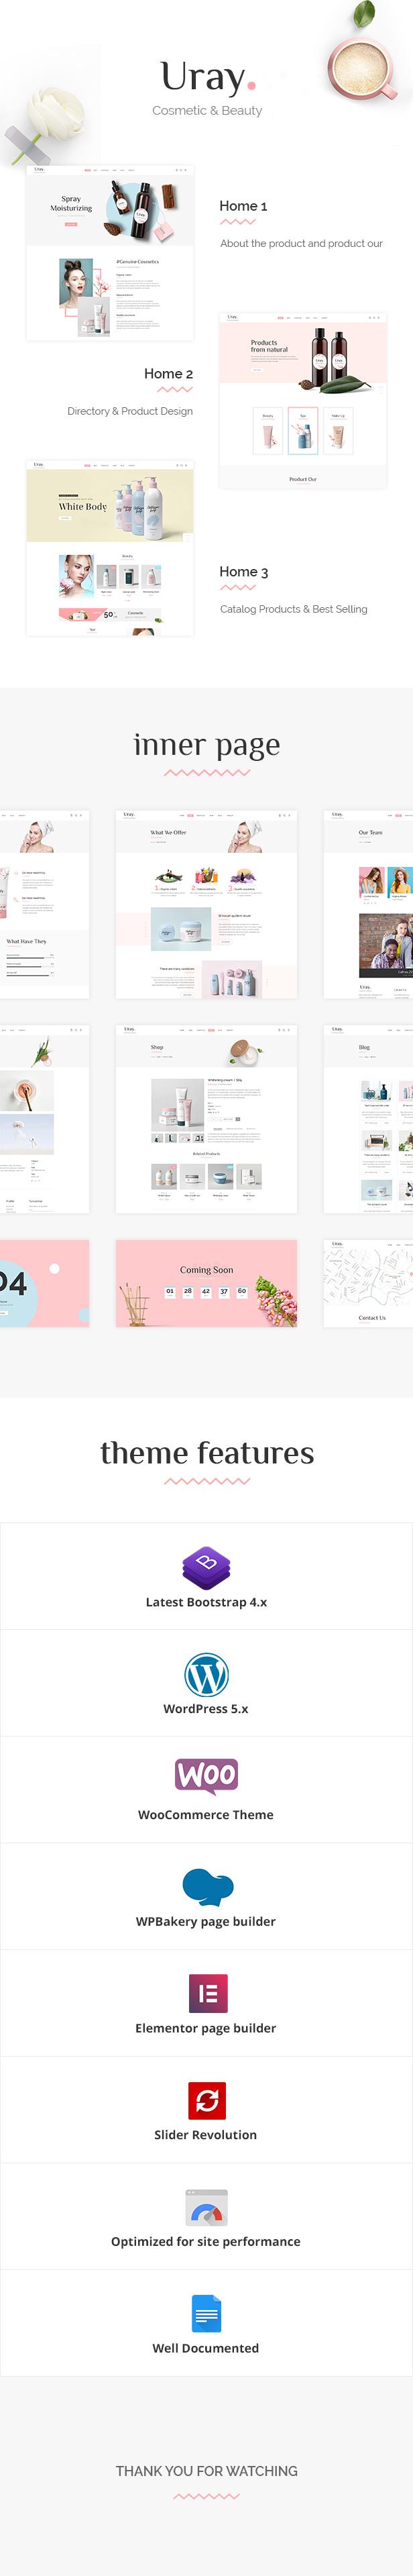 Cosmetic & Beauty Shop WordPress WooCommerce Theme - 1